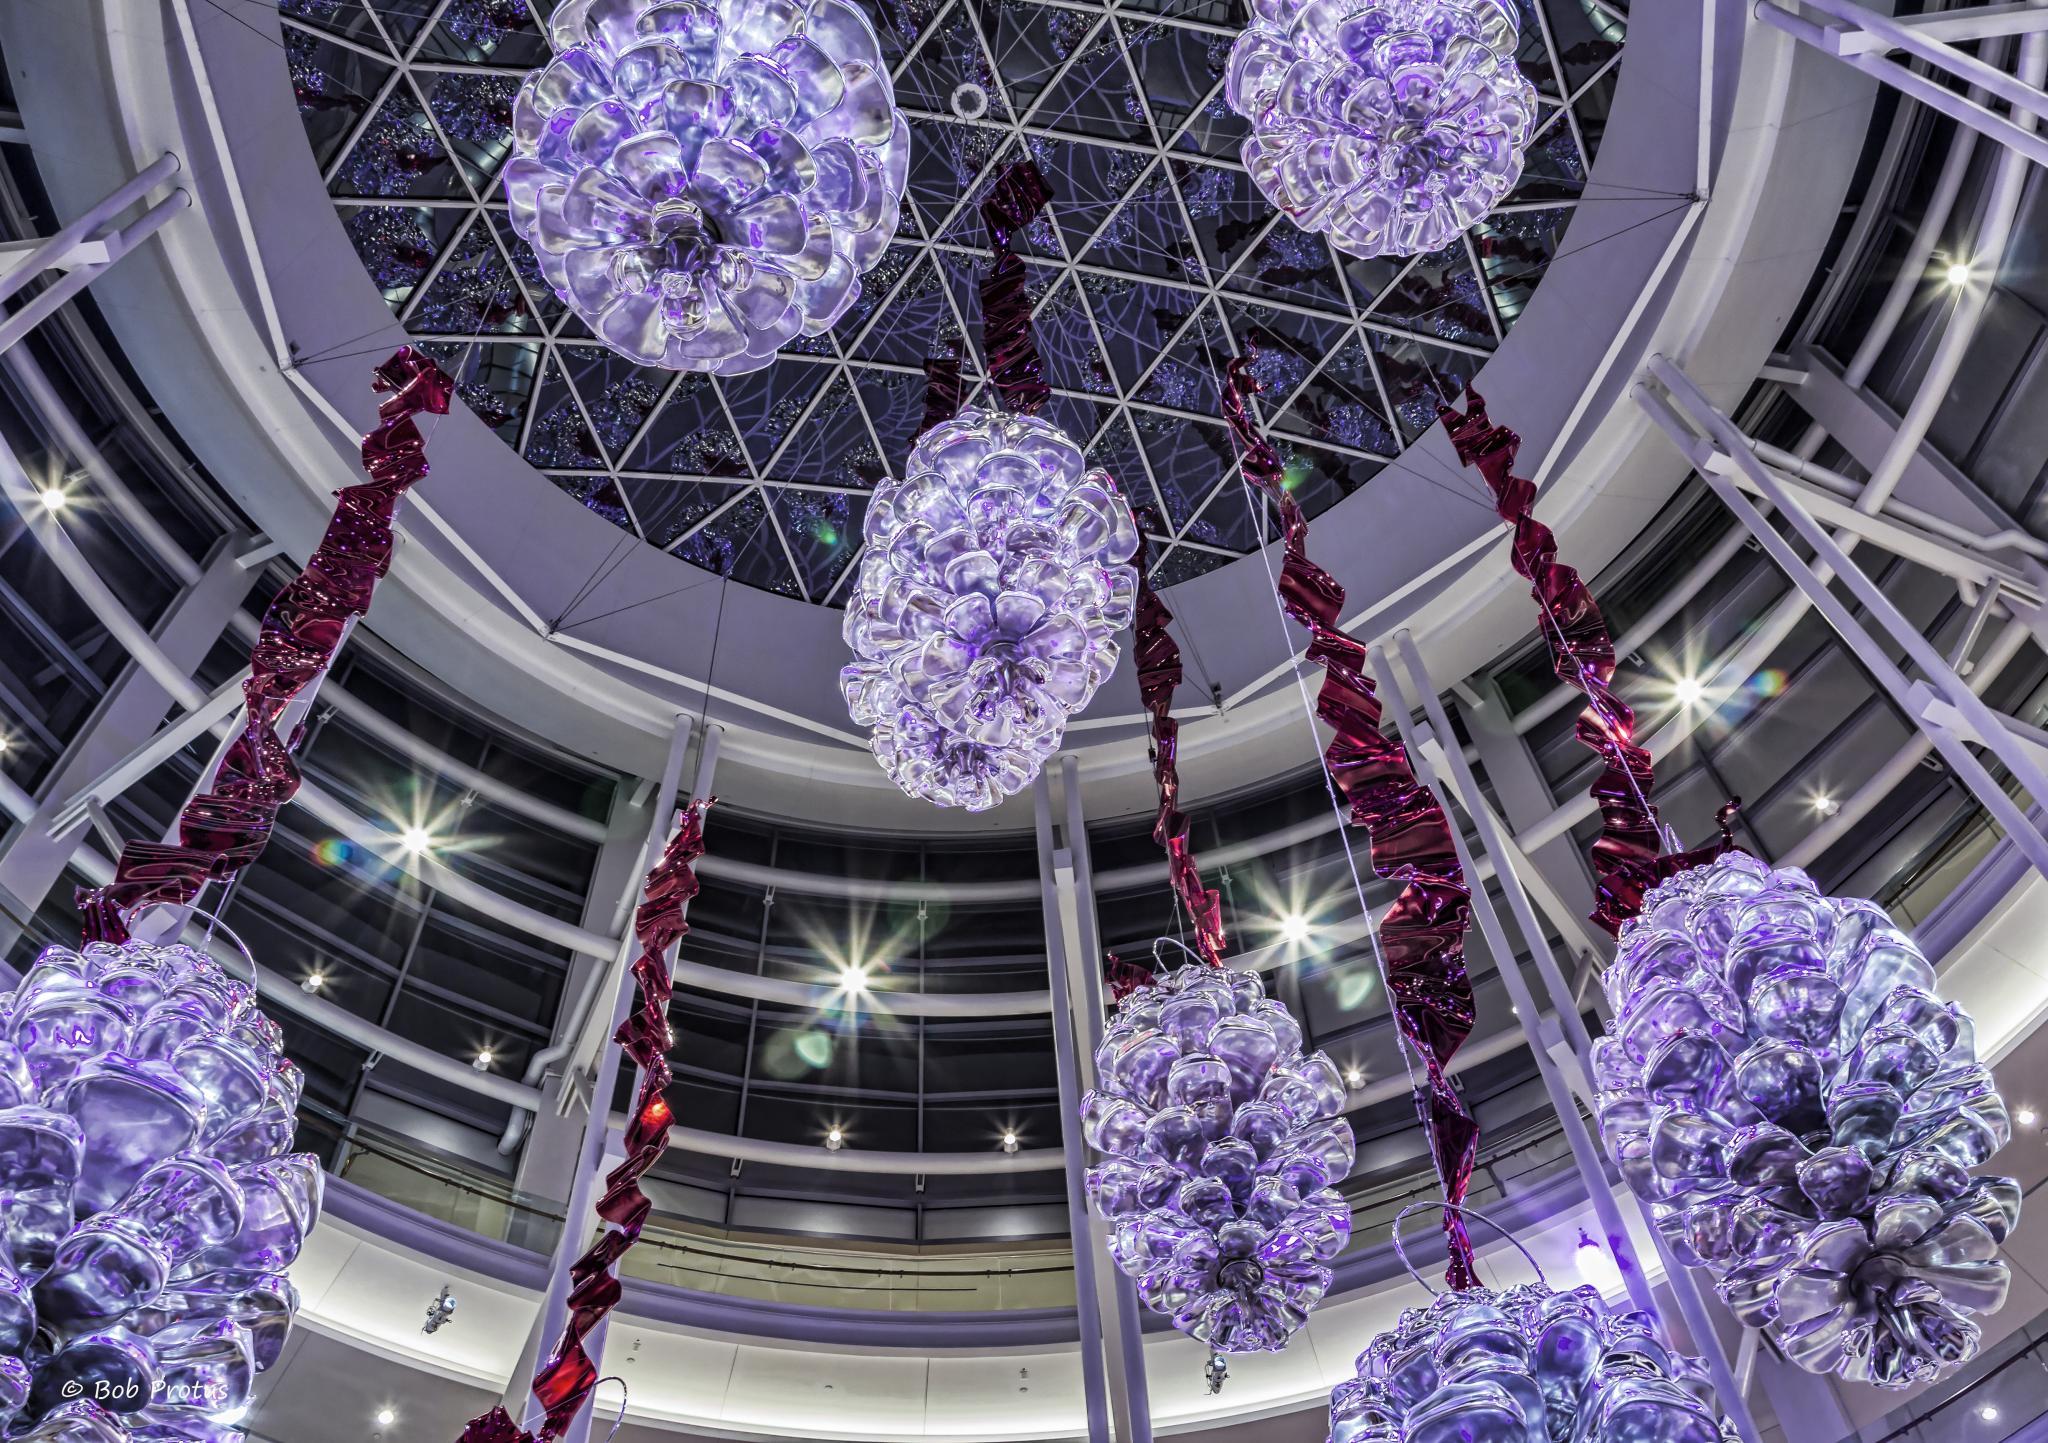 fileholiday decorationsjpg - Holiday Decorations